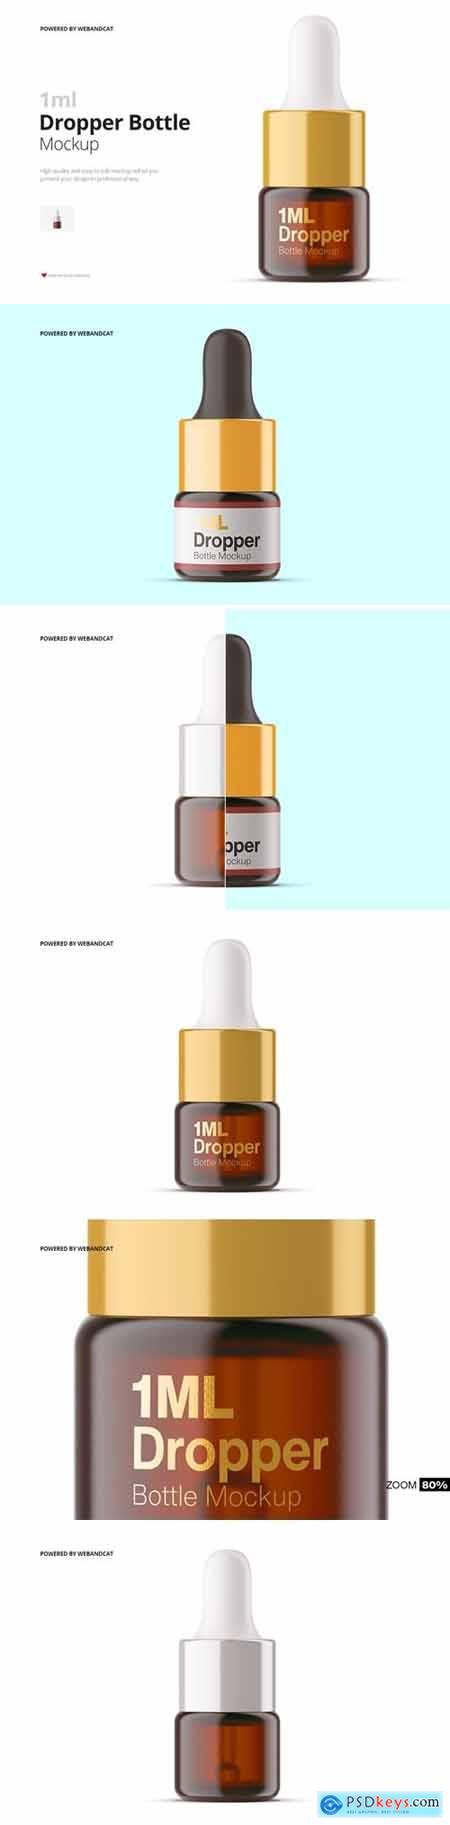 1ml Amber Glass Dropper Bottle Mockup